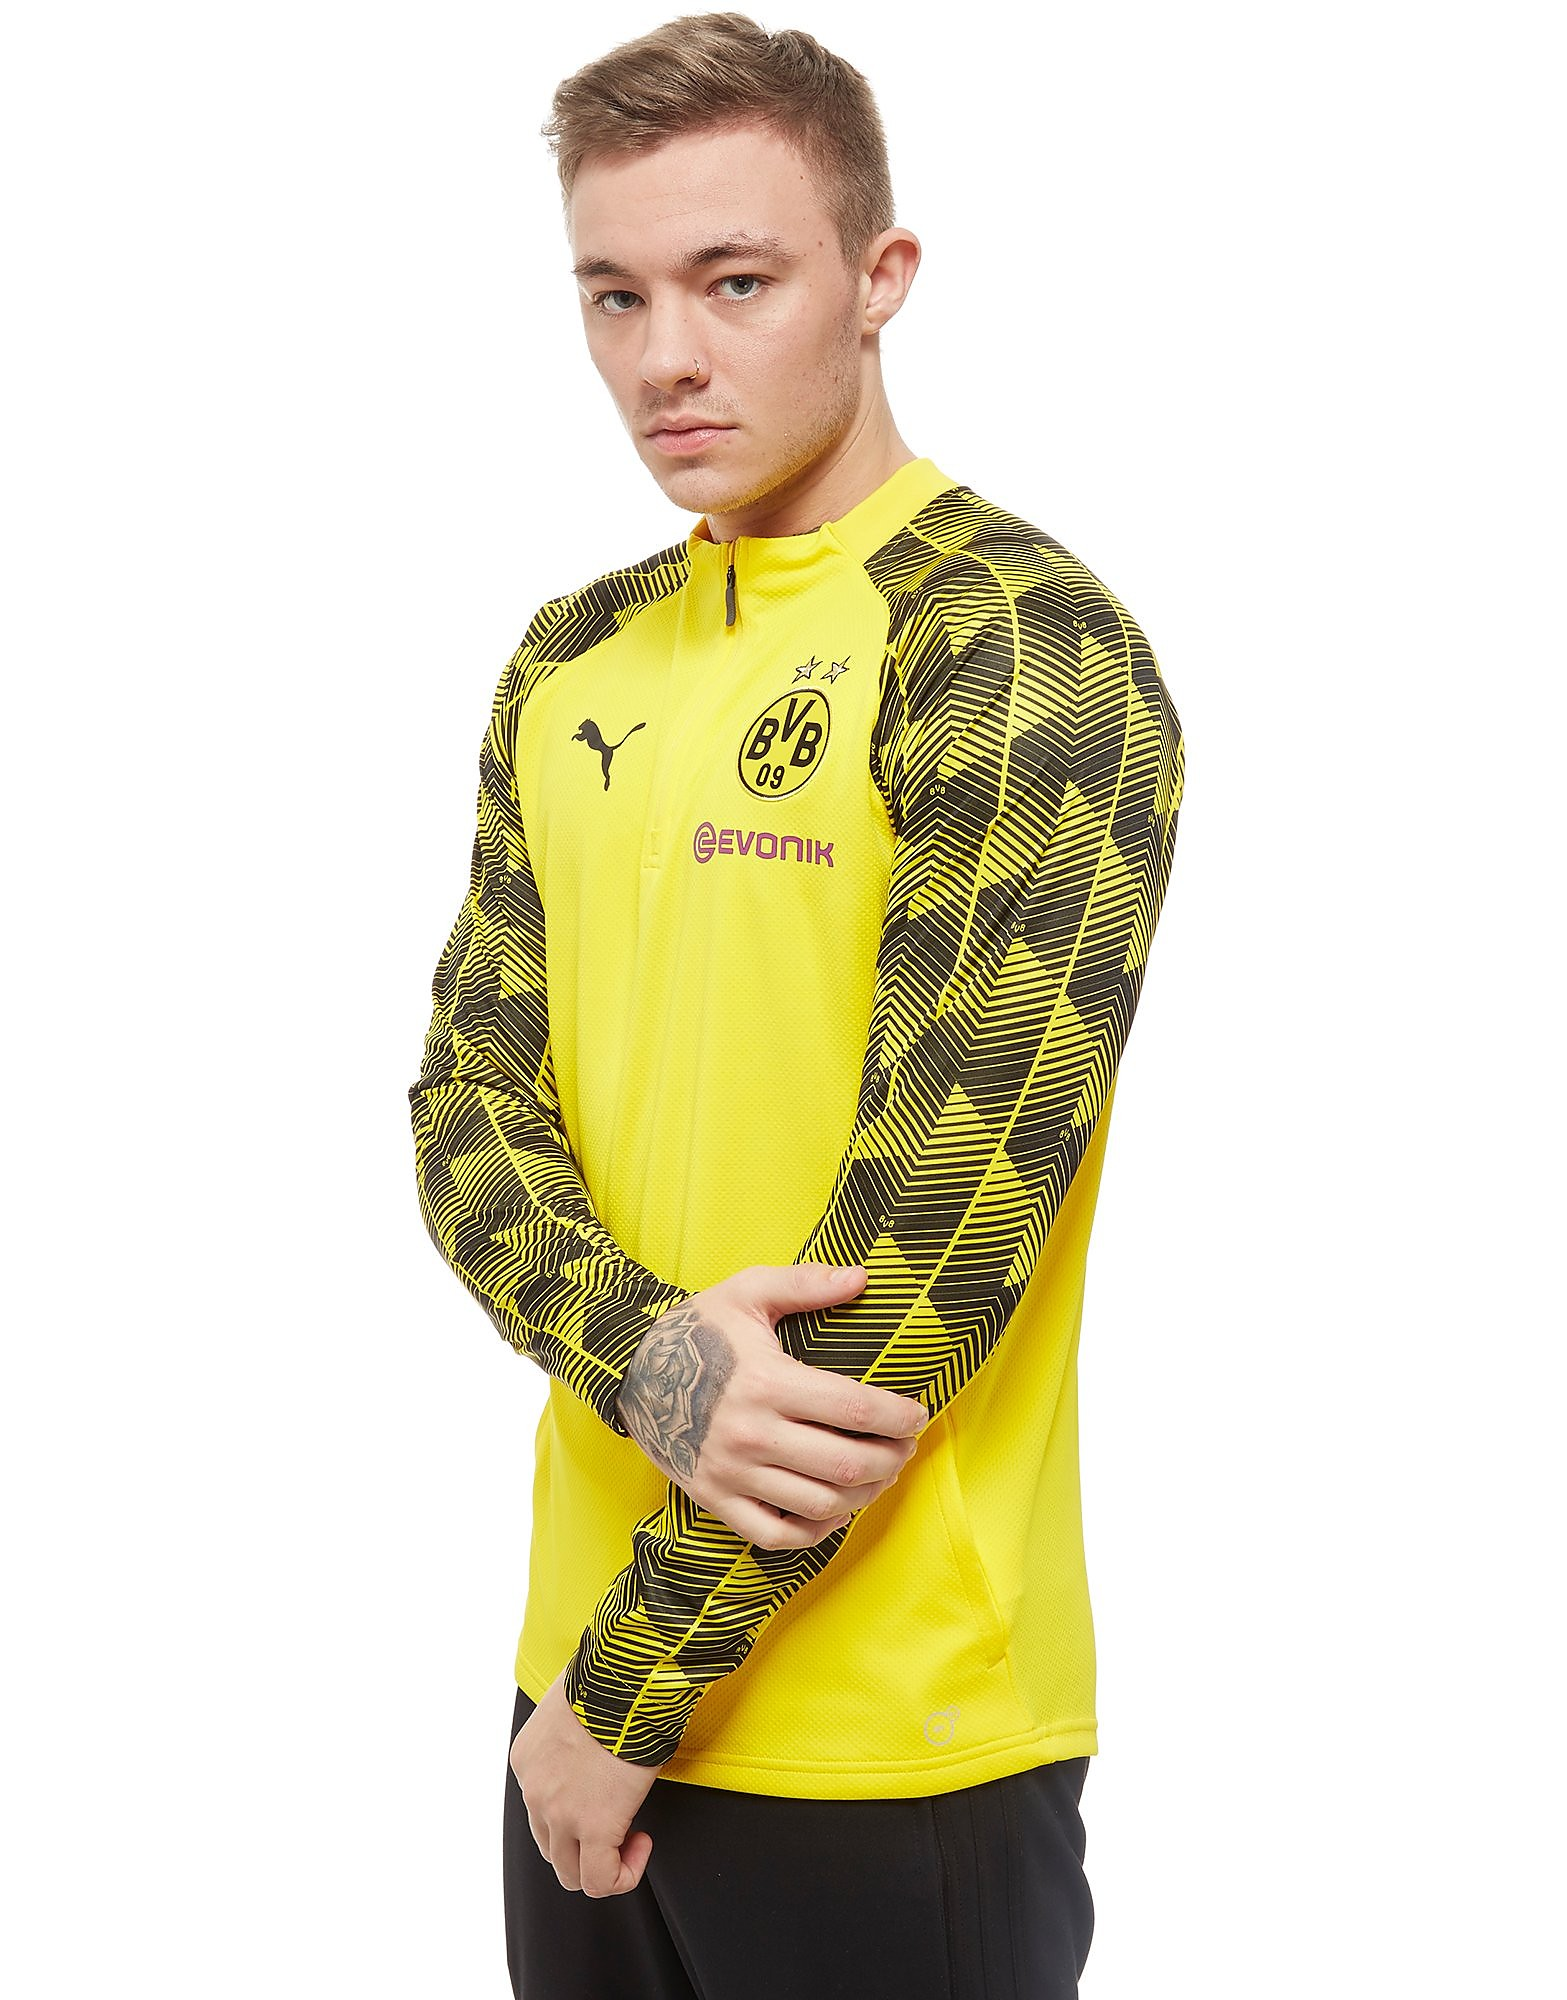 PUMA Borussia Dortmund 2018 1/4 Zip Training Top